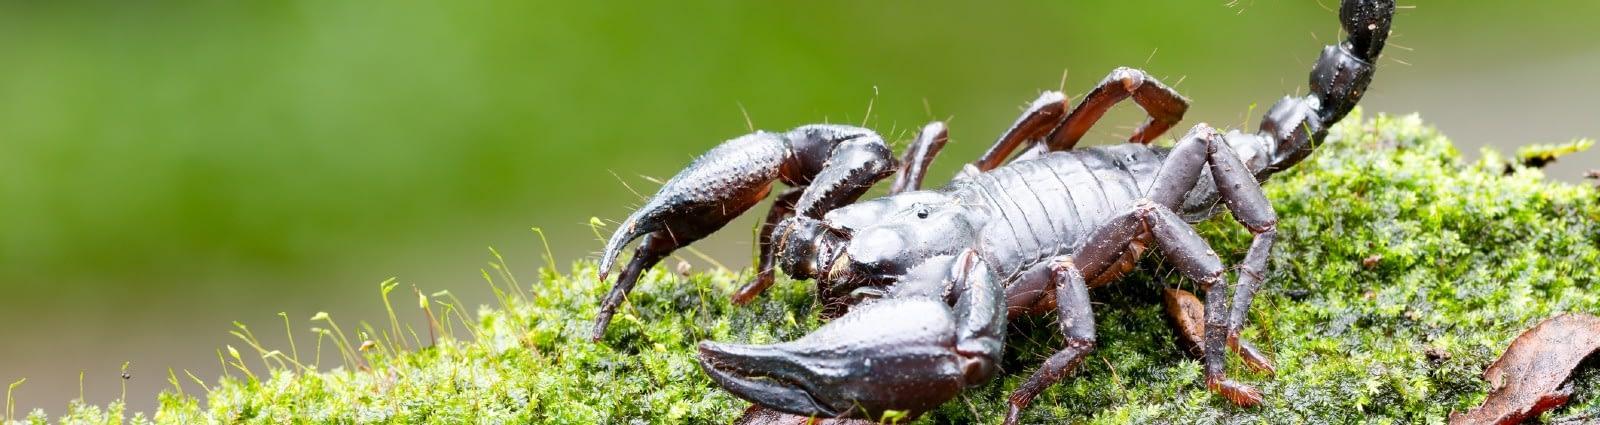 How to Get Rid of Scorpions in Phoenix, AZ | SOS Blog